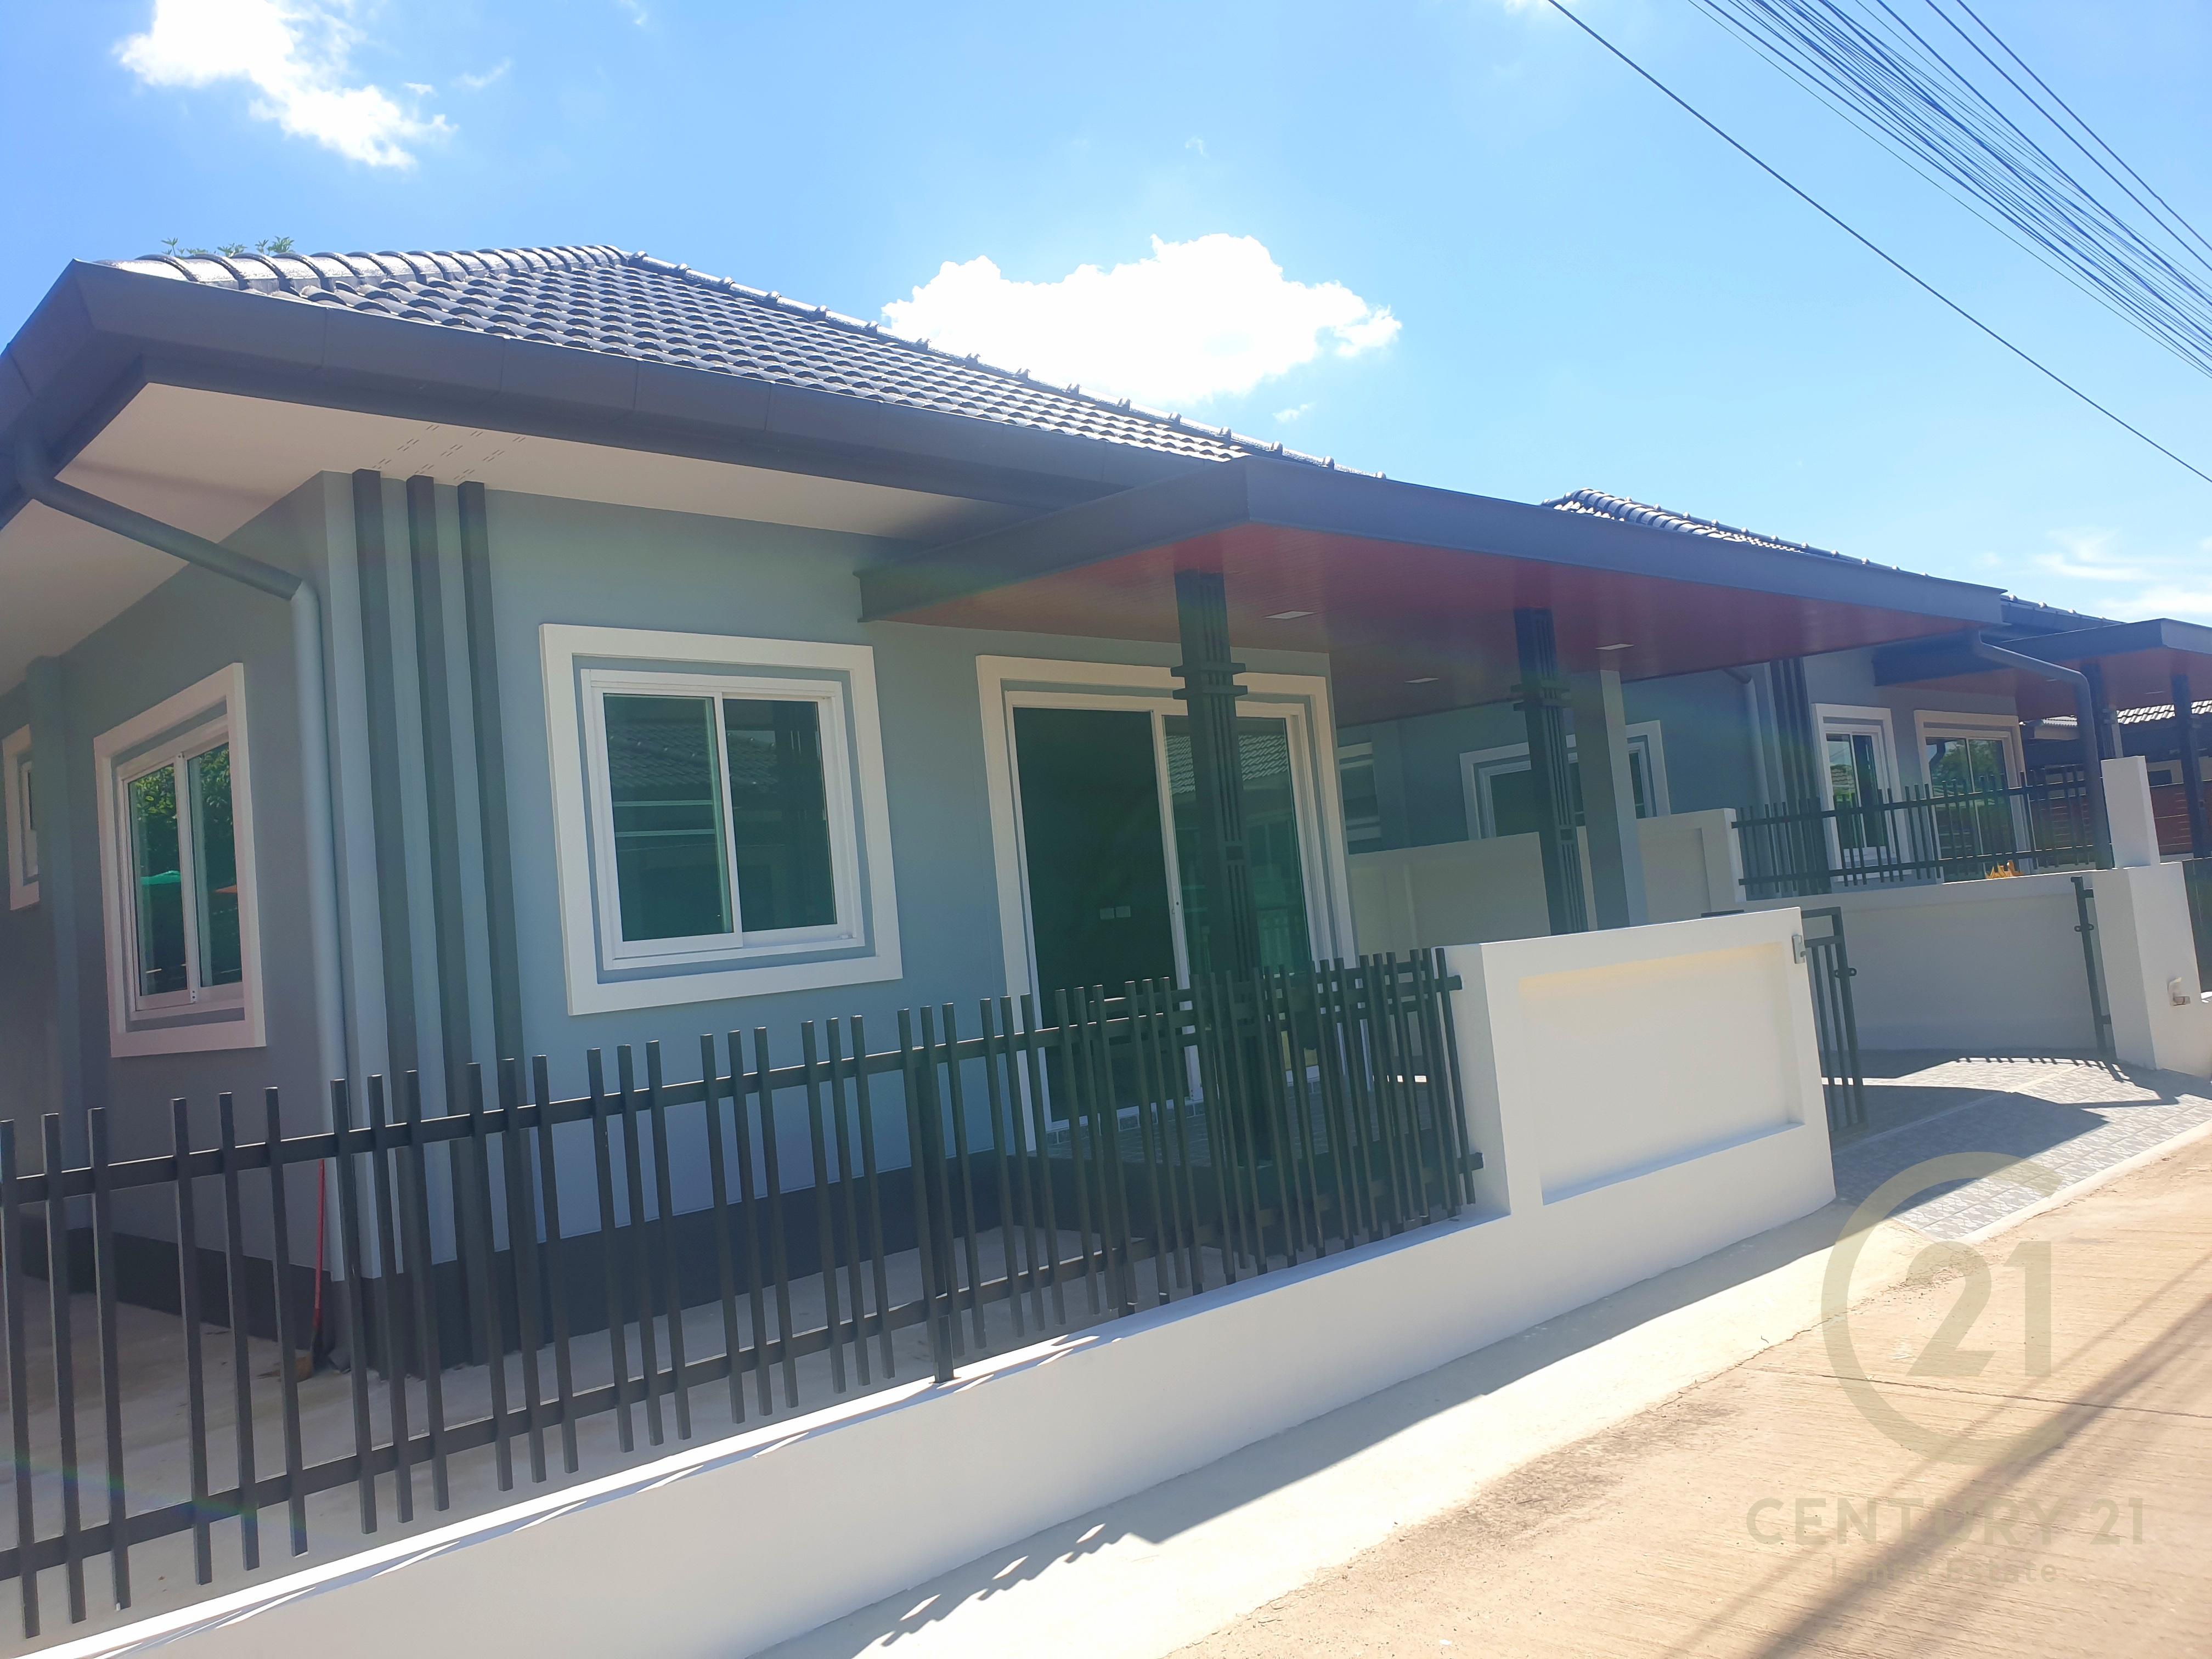 2 Bedroom House Sale Sansai Chiang Mai